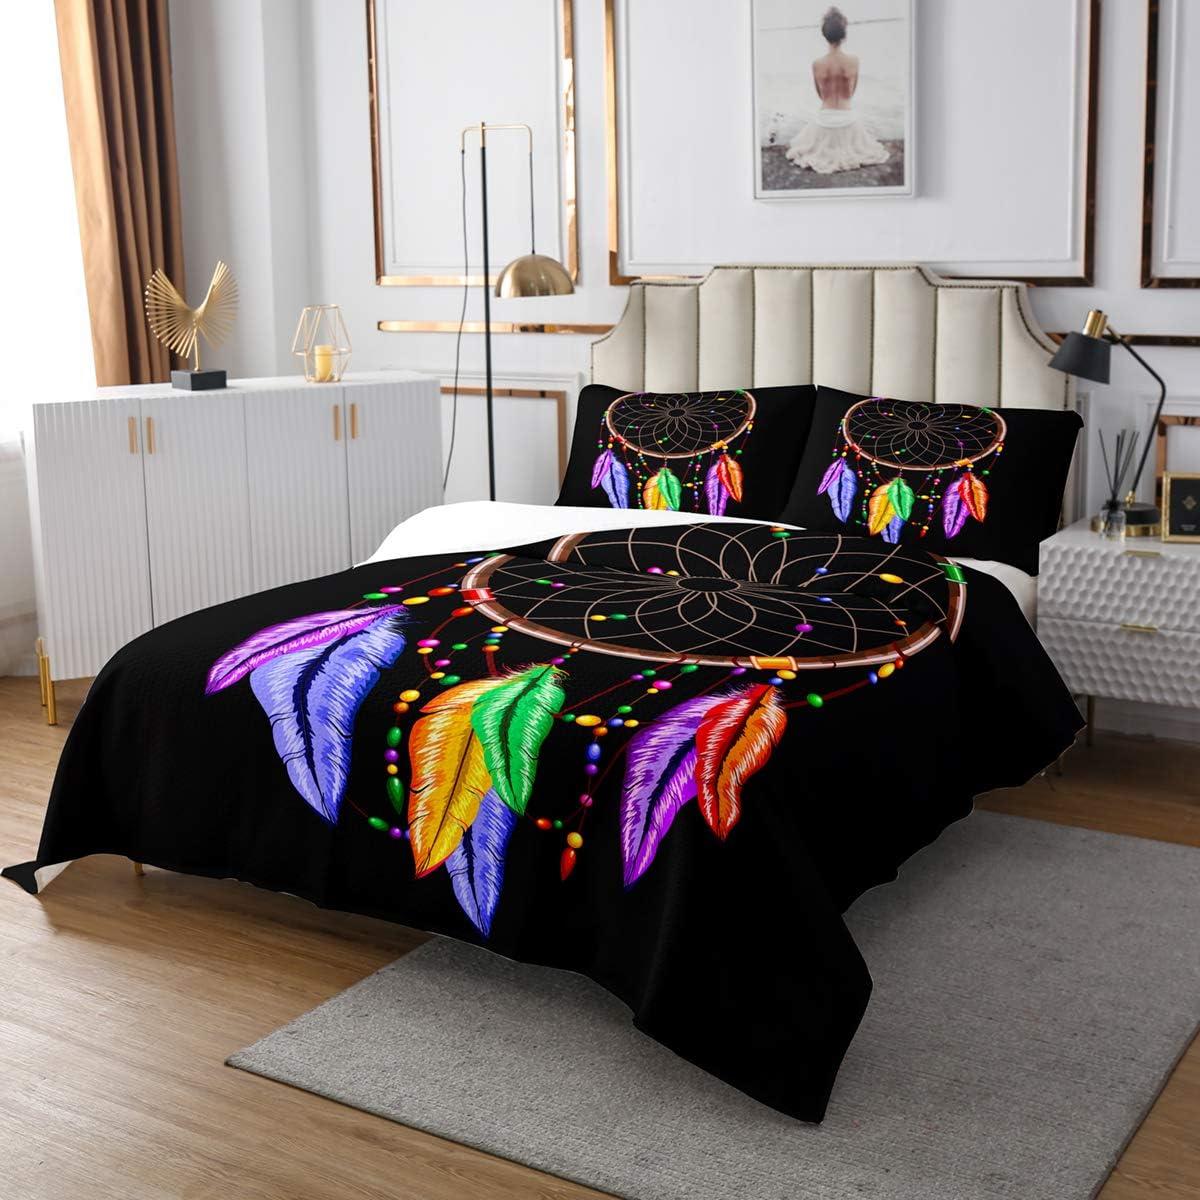 Erosebridal Dream Catcher Feather Quilted Coverlet King Size Bohemian Mandala Coverlet Set, Tie-Dye Spiral Bedspread for Kids Boys Girls Teens Boho Chic Floral Quilt Bedroom Decor